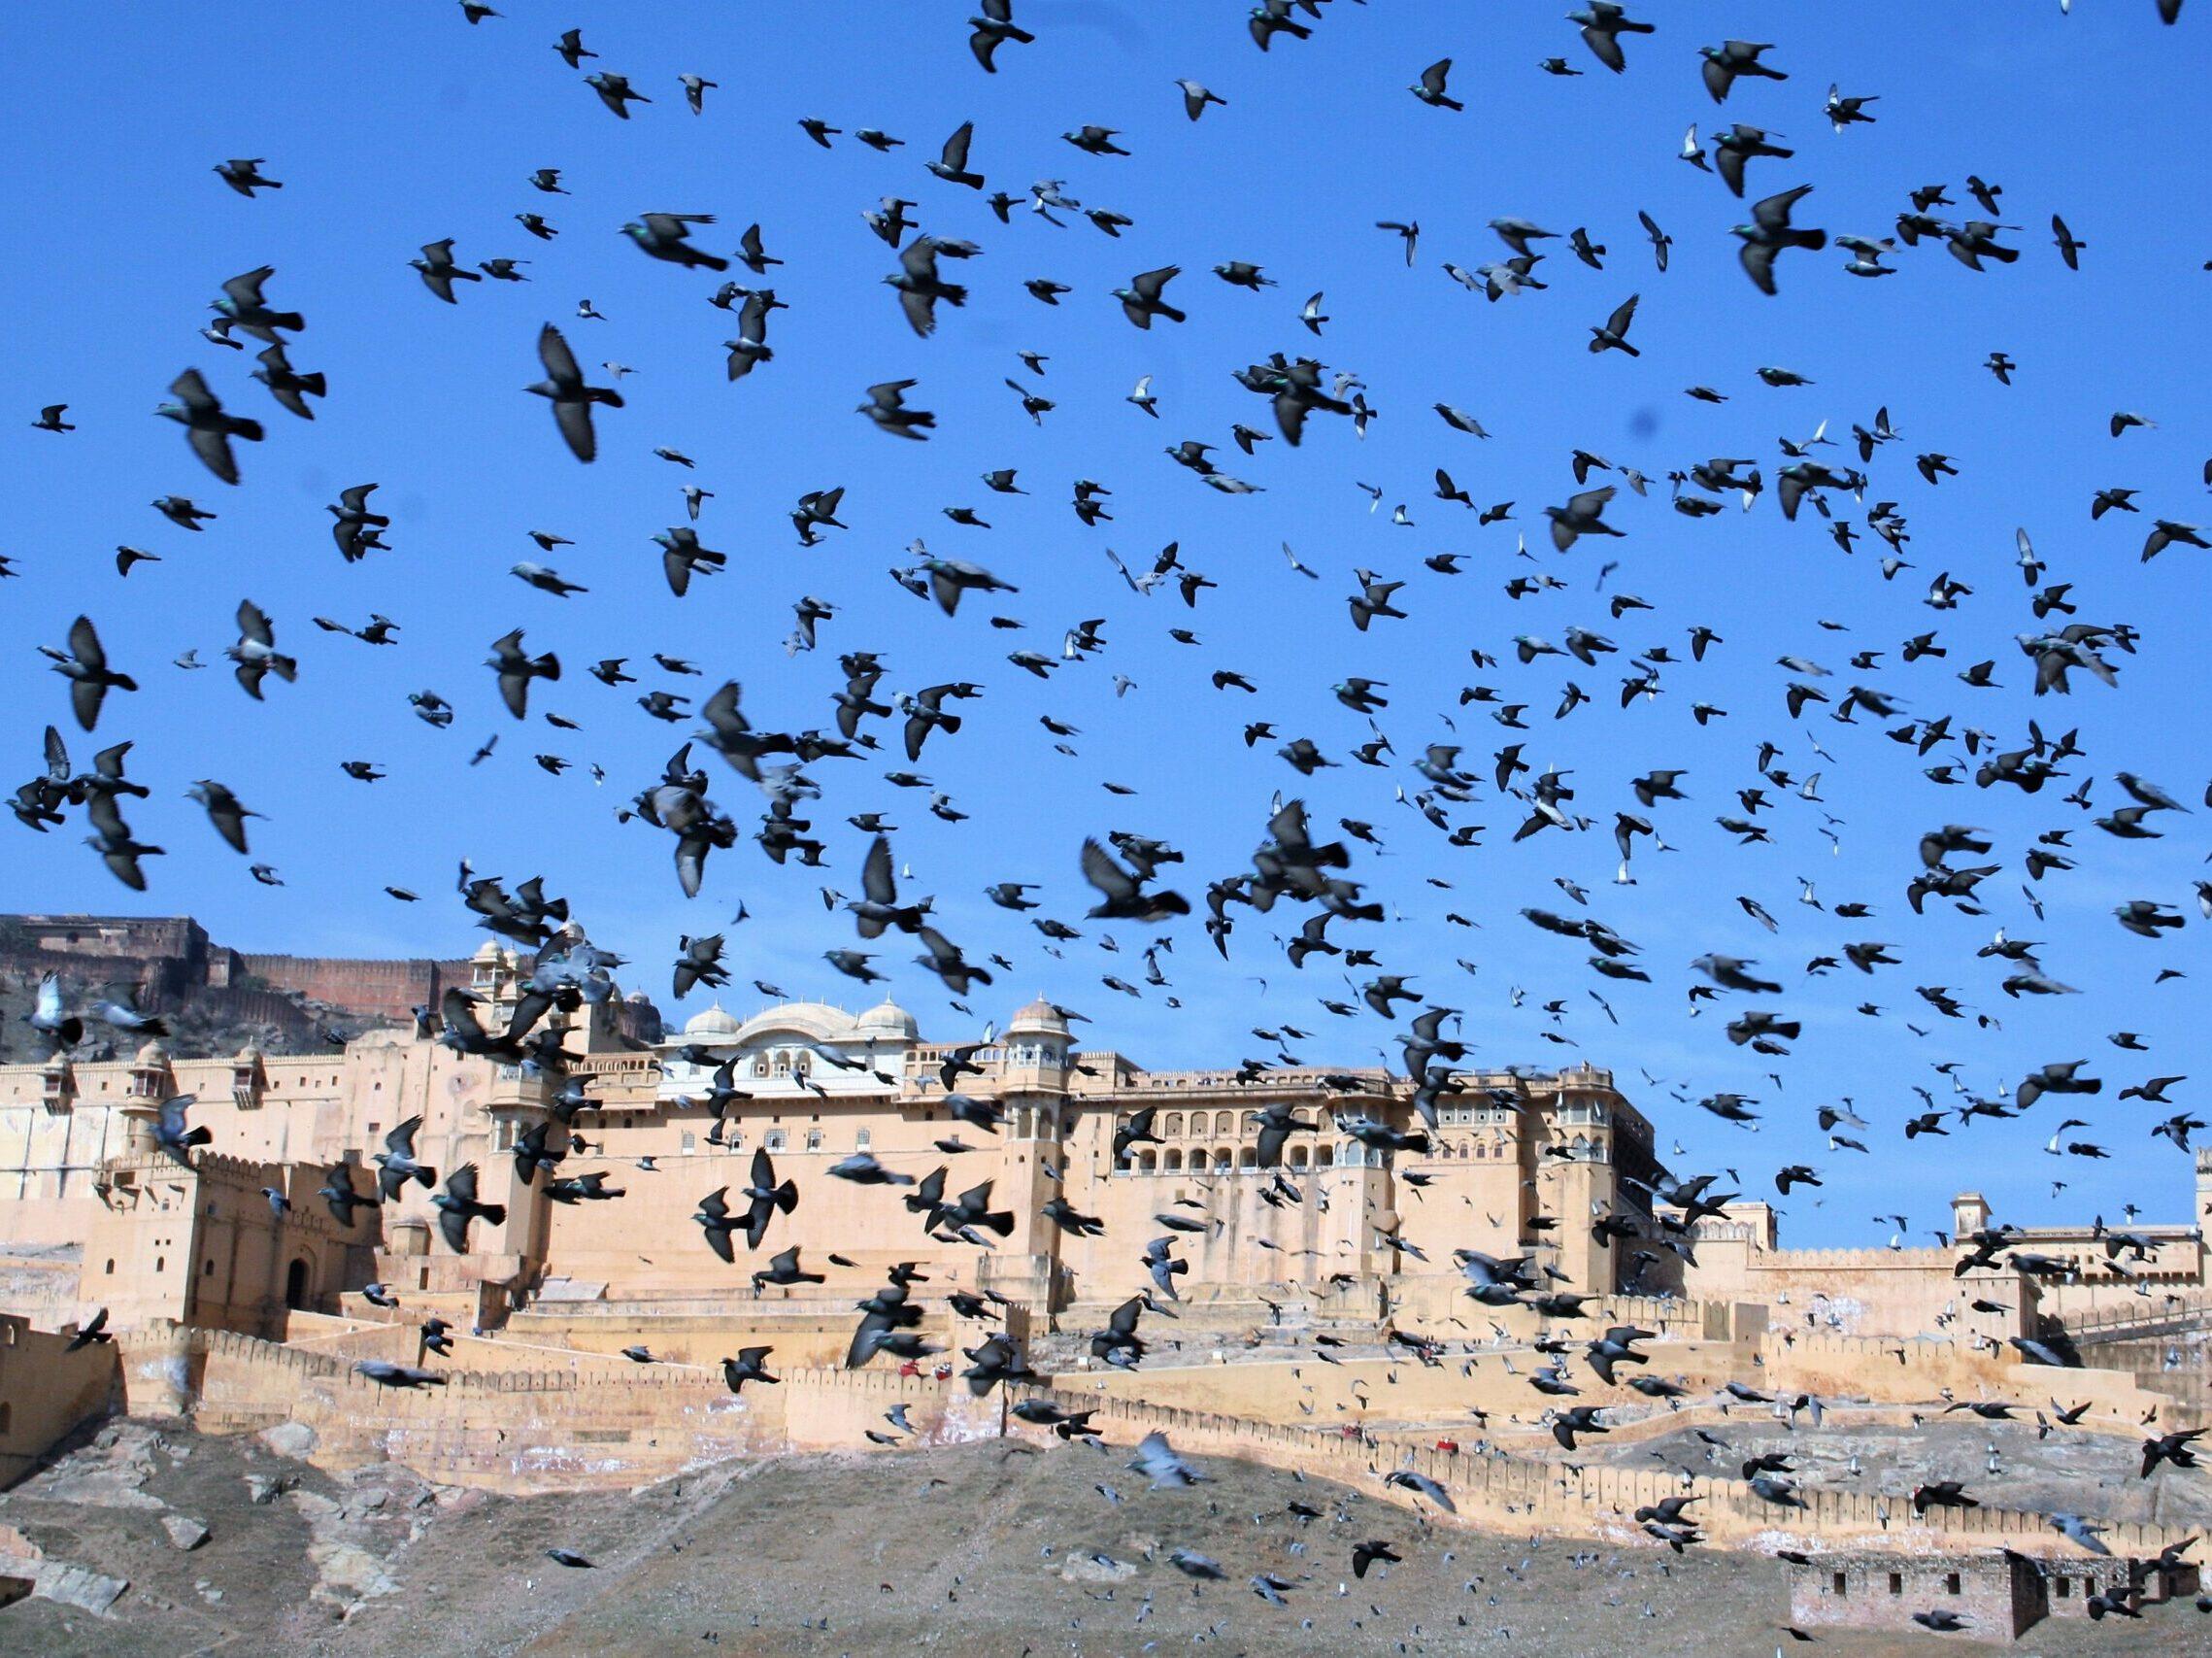 Jaipur, India bird sky